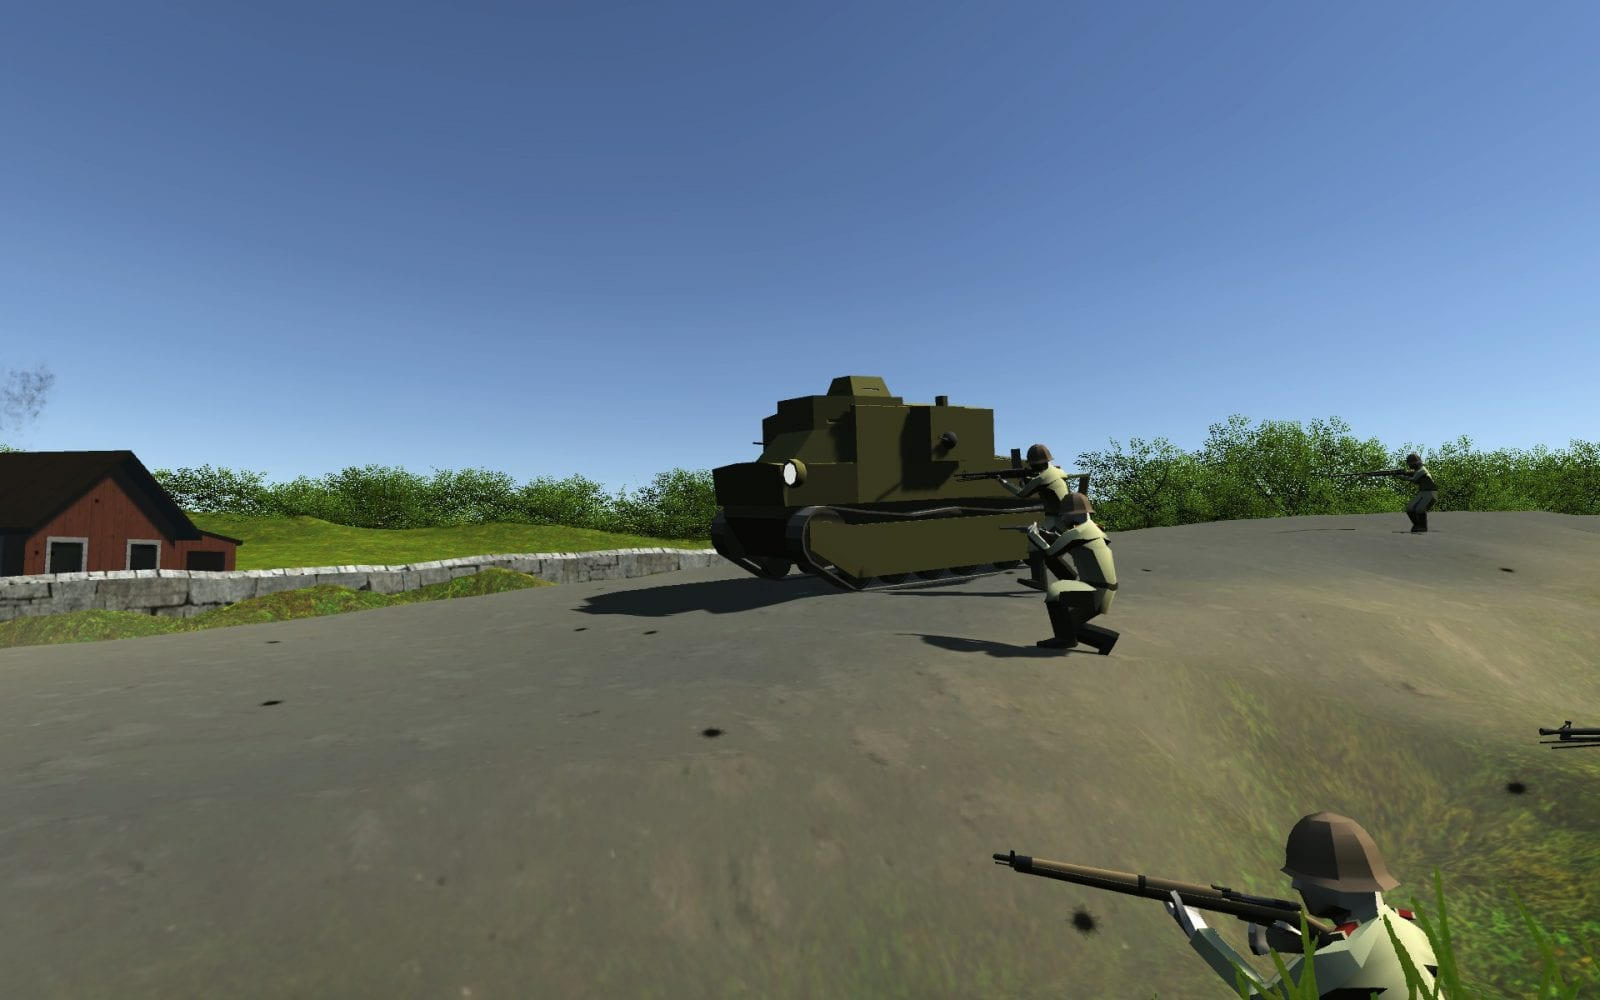 DeRiss SP-16 Mod for Ravenfield